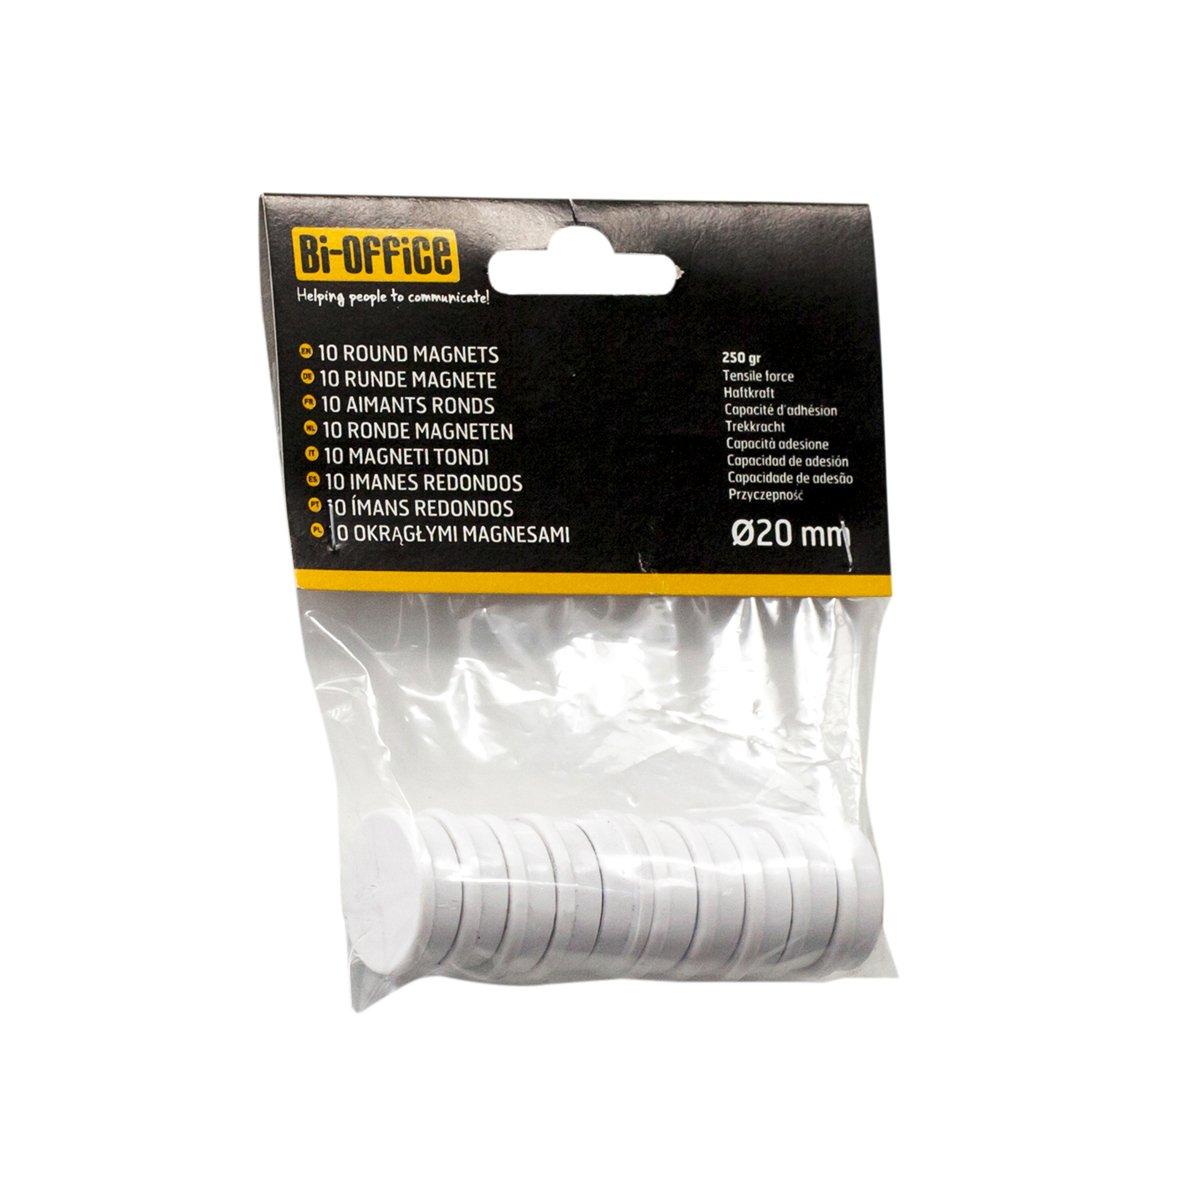 Bi-Office IM141609 Magneti da 20 mm, 10 x 20 x 5 mm, Bianco IM140509